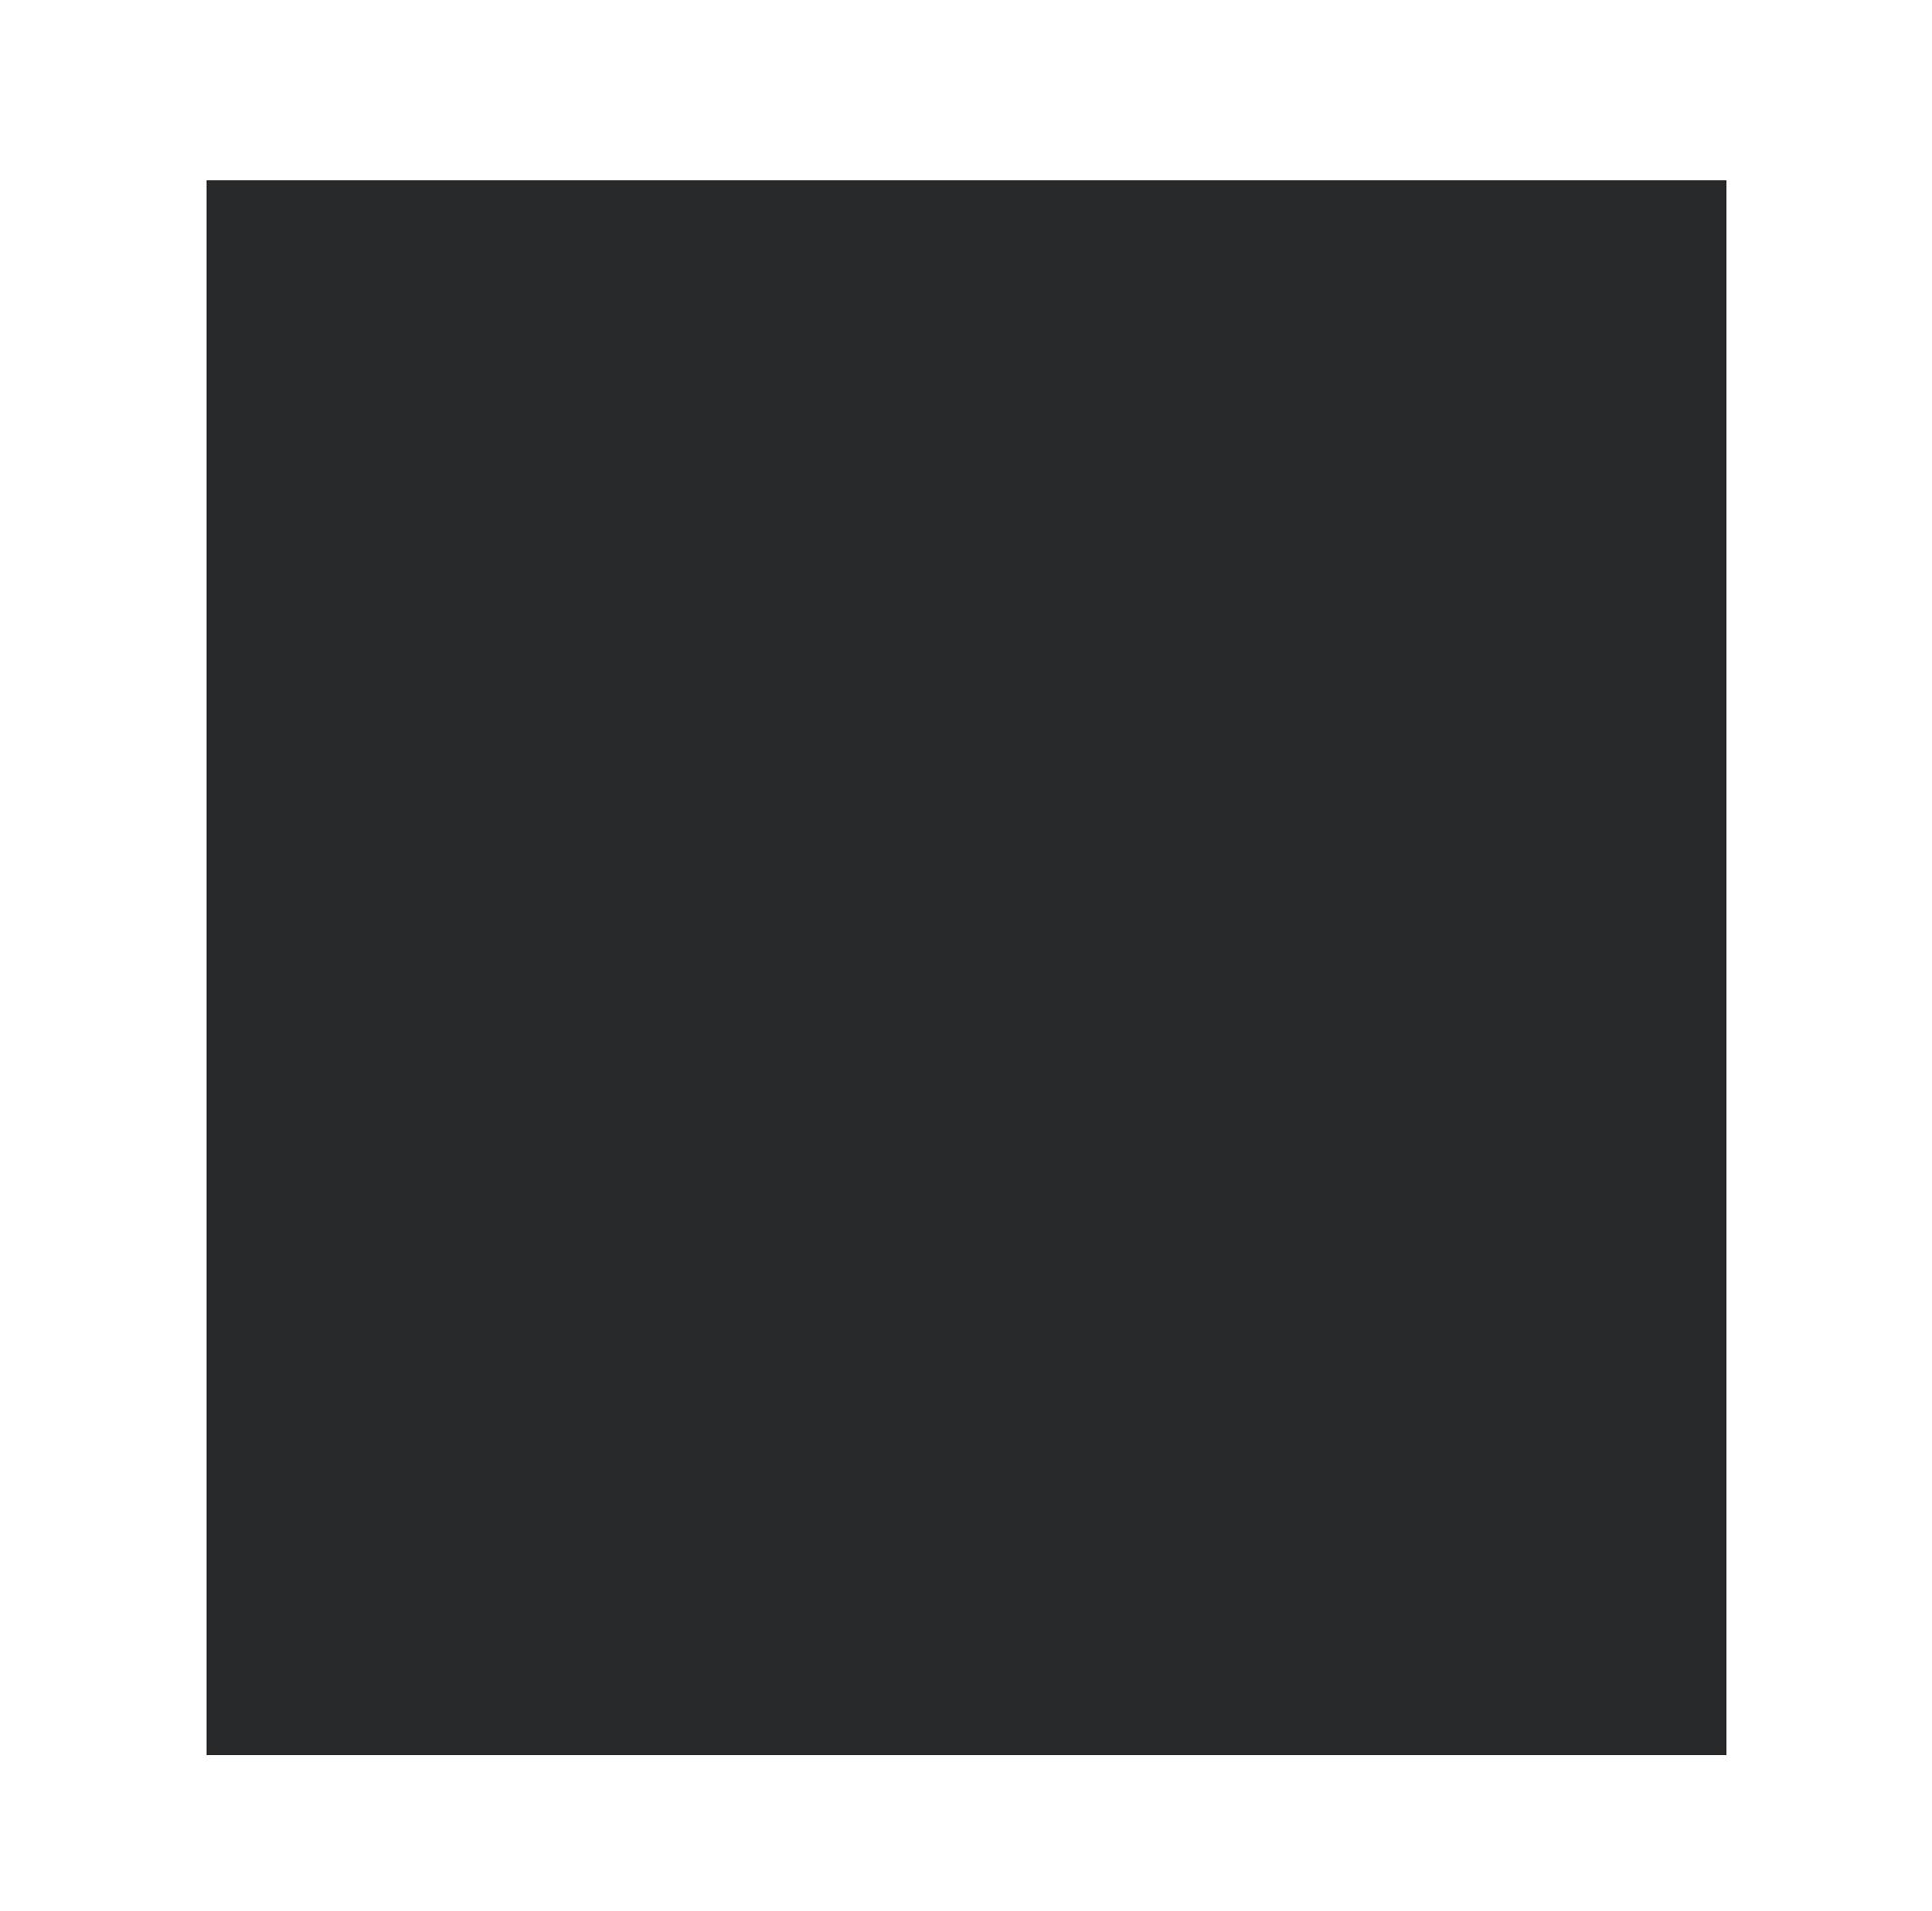 Allan Ohr